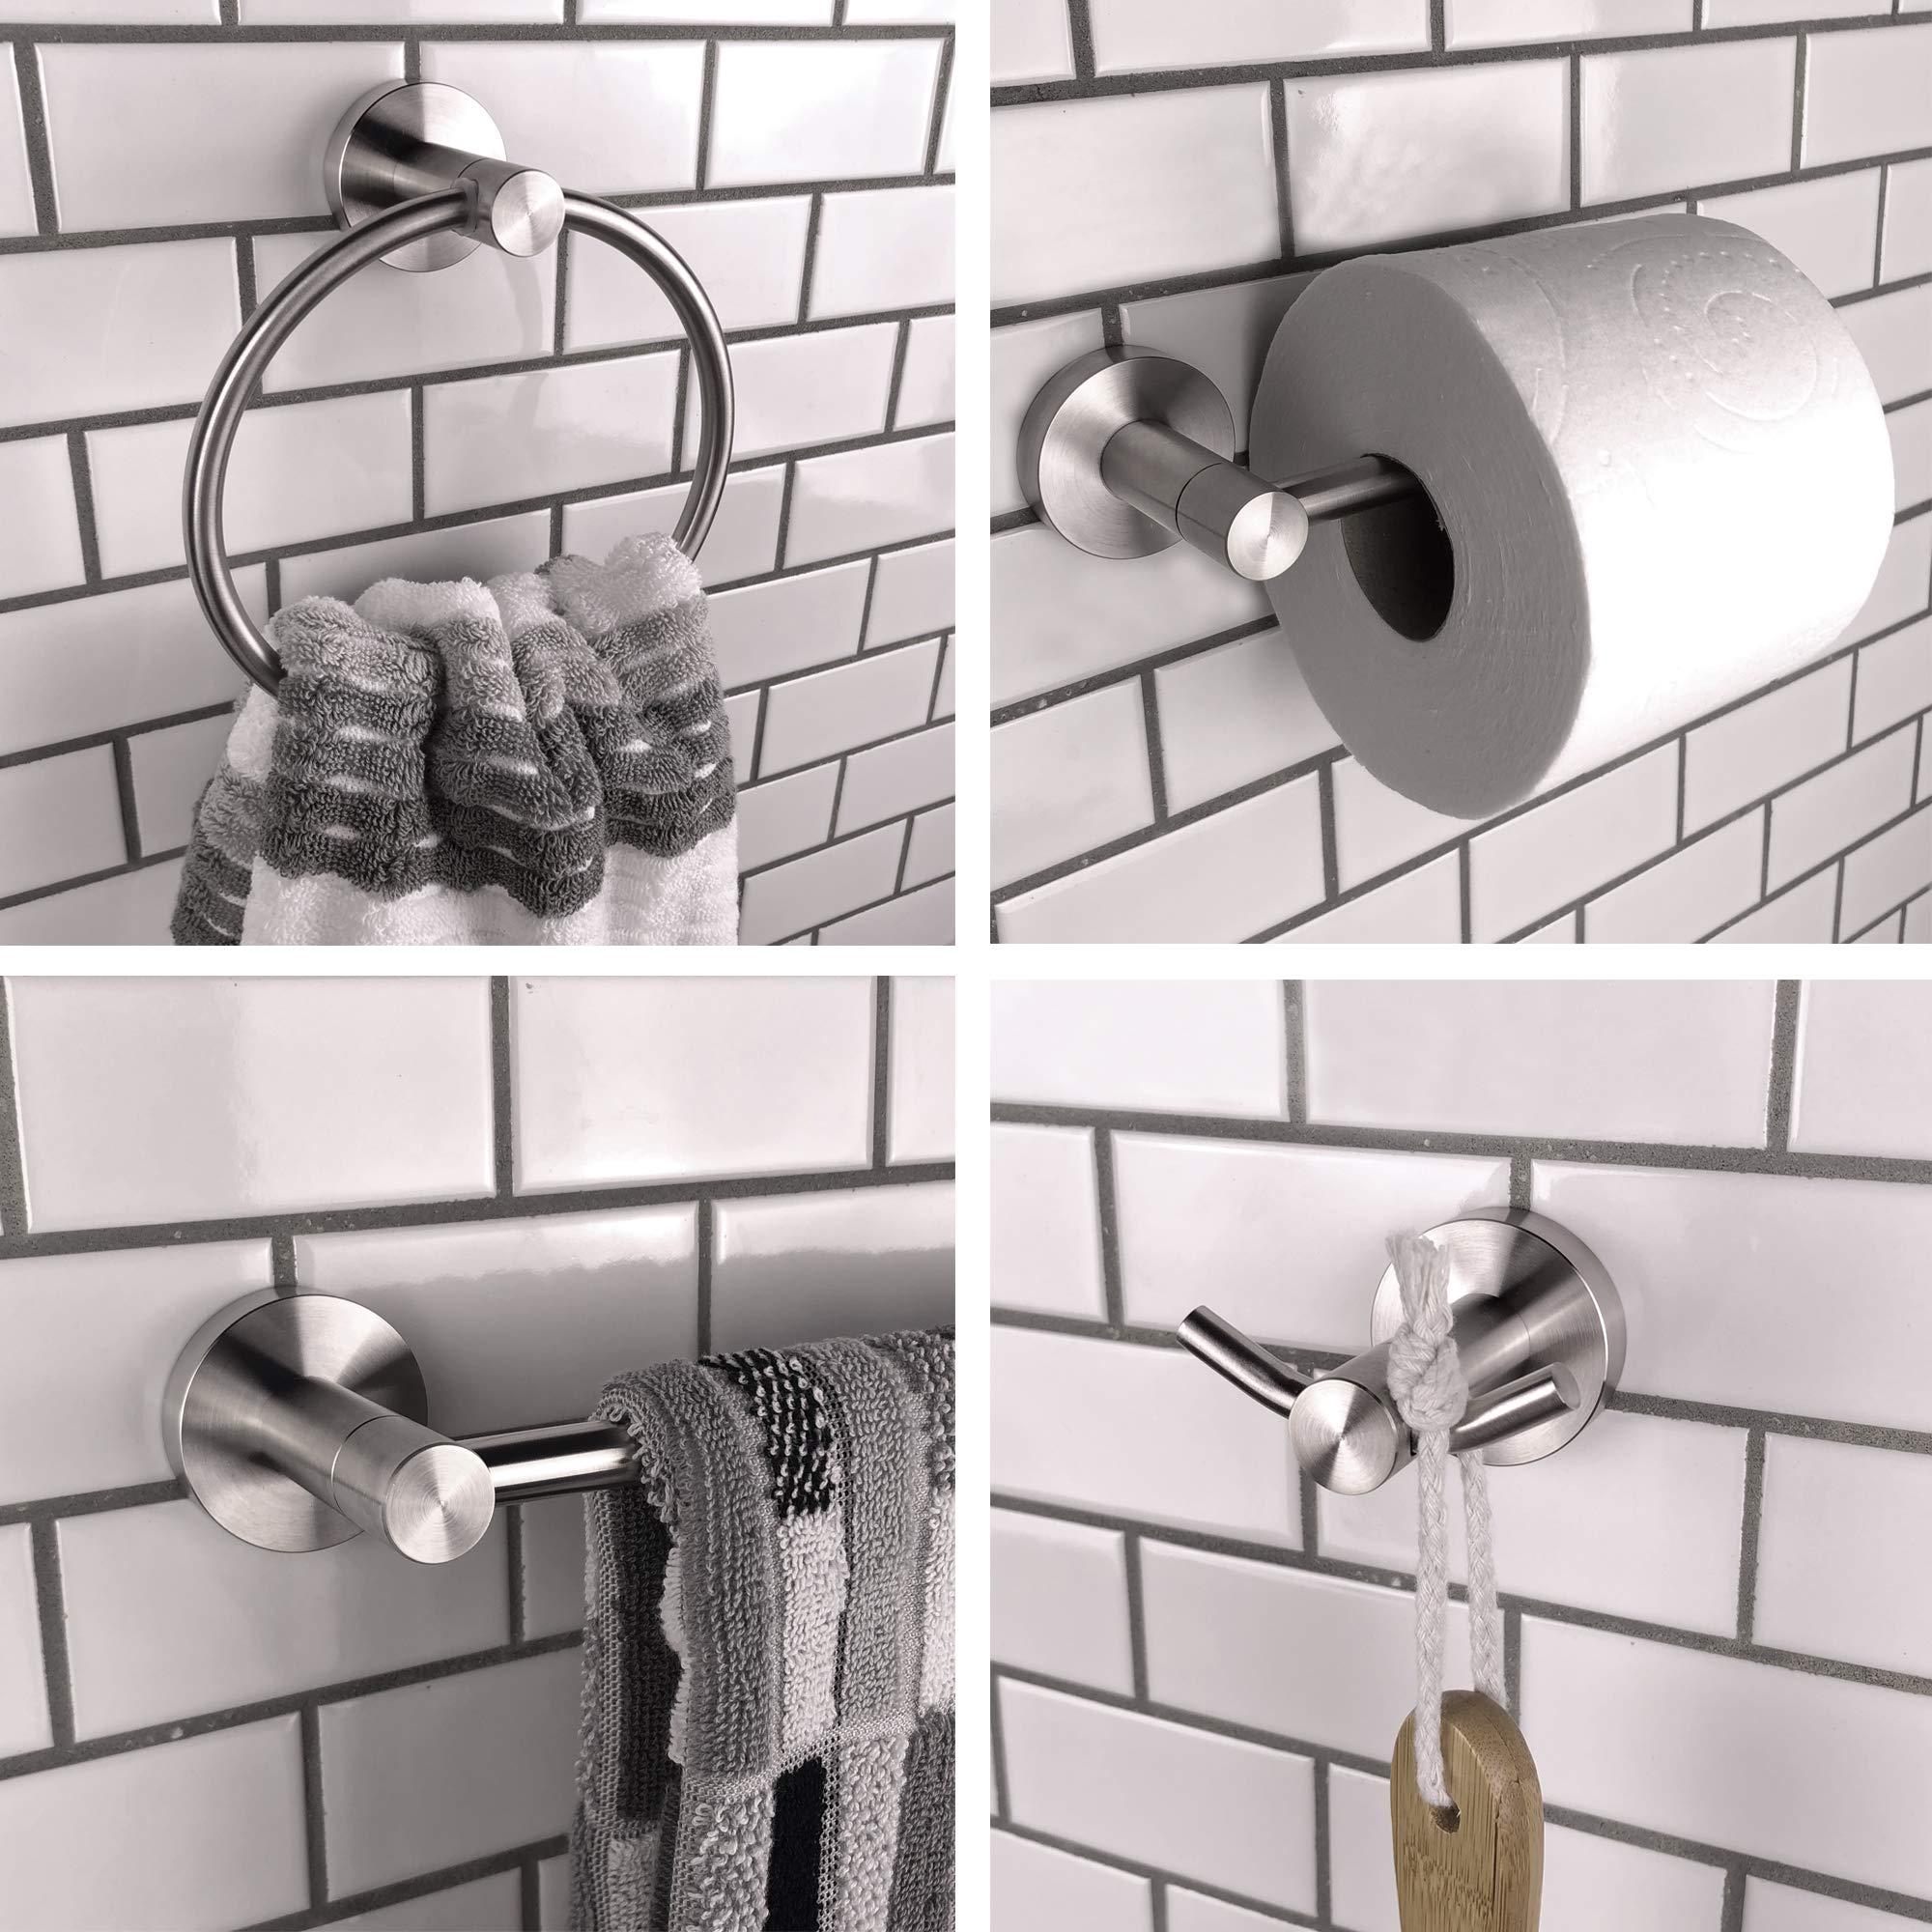 4-Piece Brushed Nickel Bathroom Accessories Hardware Set, Wall Mounted & Rustproof Bath Fixtures - Includes 24'' Towel Bar, Toilet Paper Holder, Towel Ring, Robe Hook - Towel Bar Set / Towel Holder Set